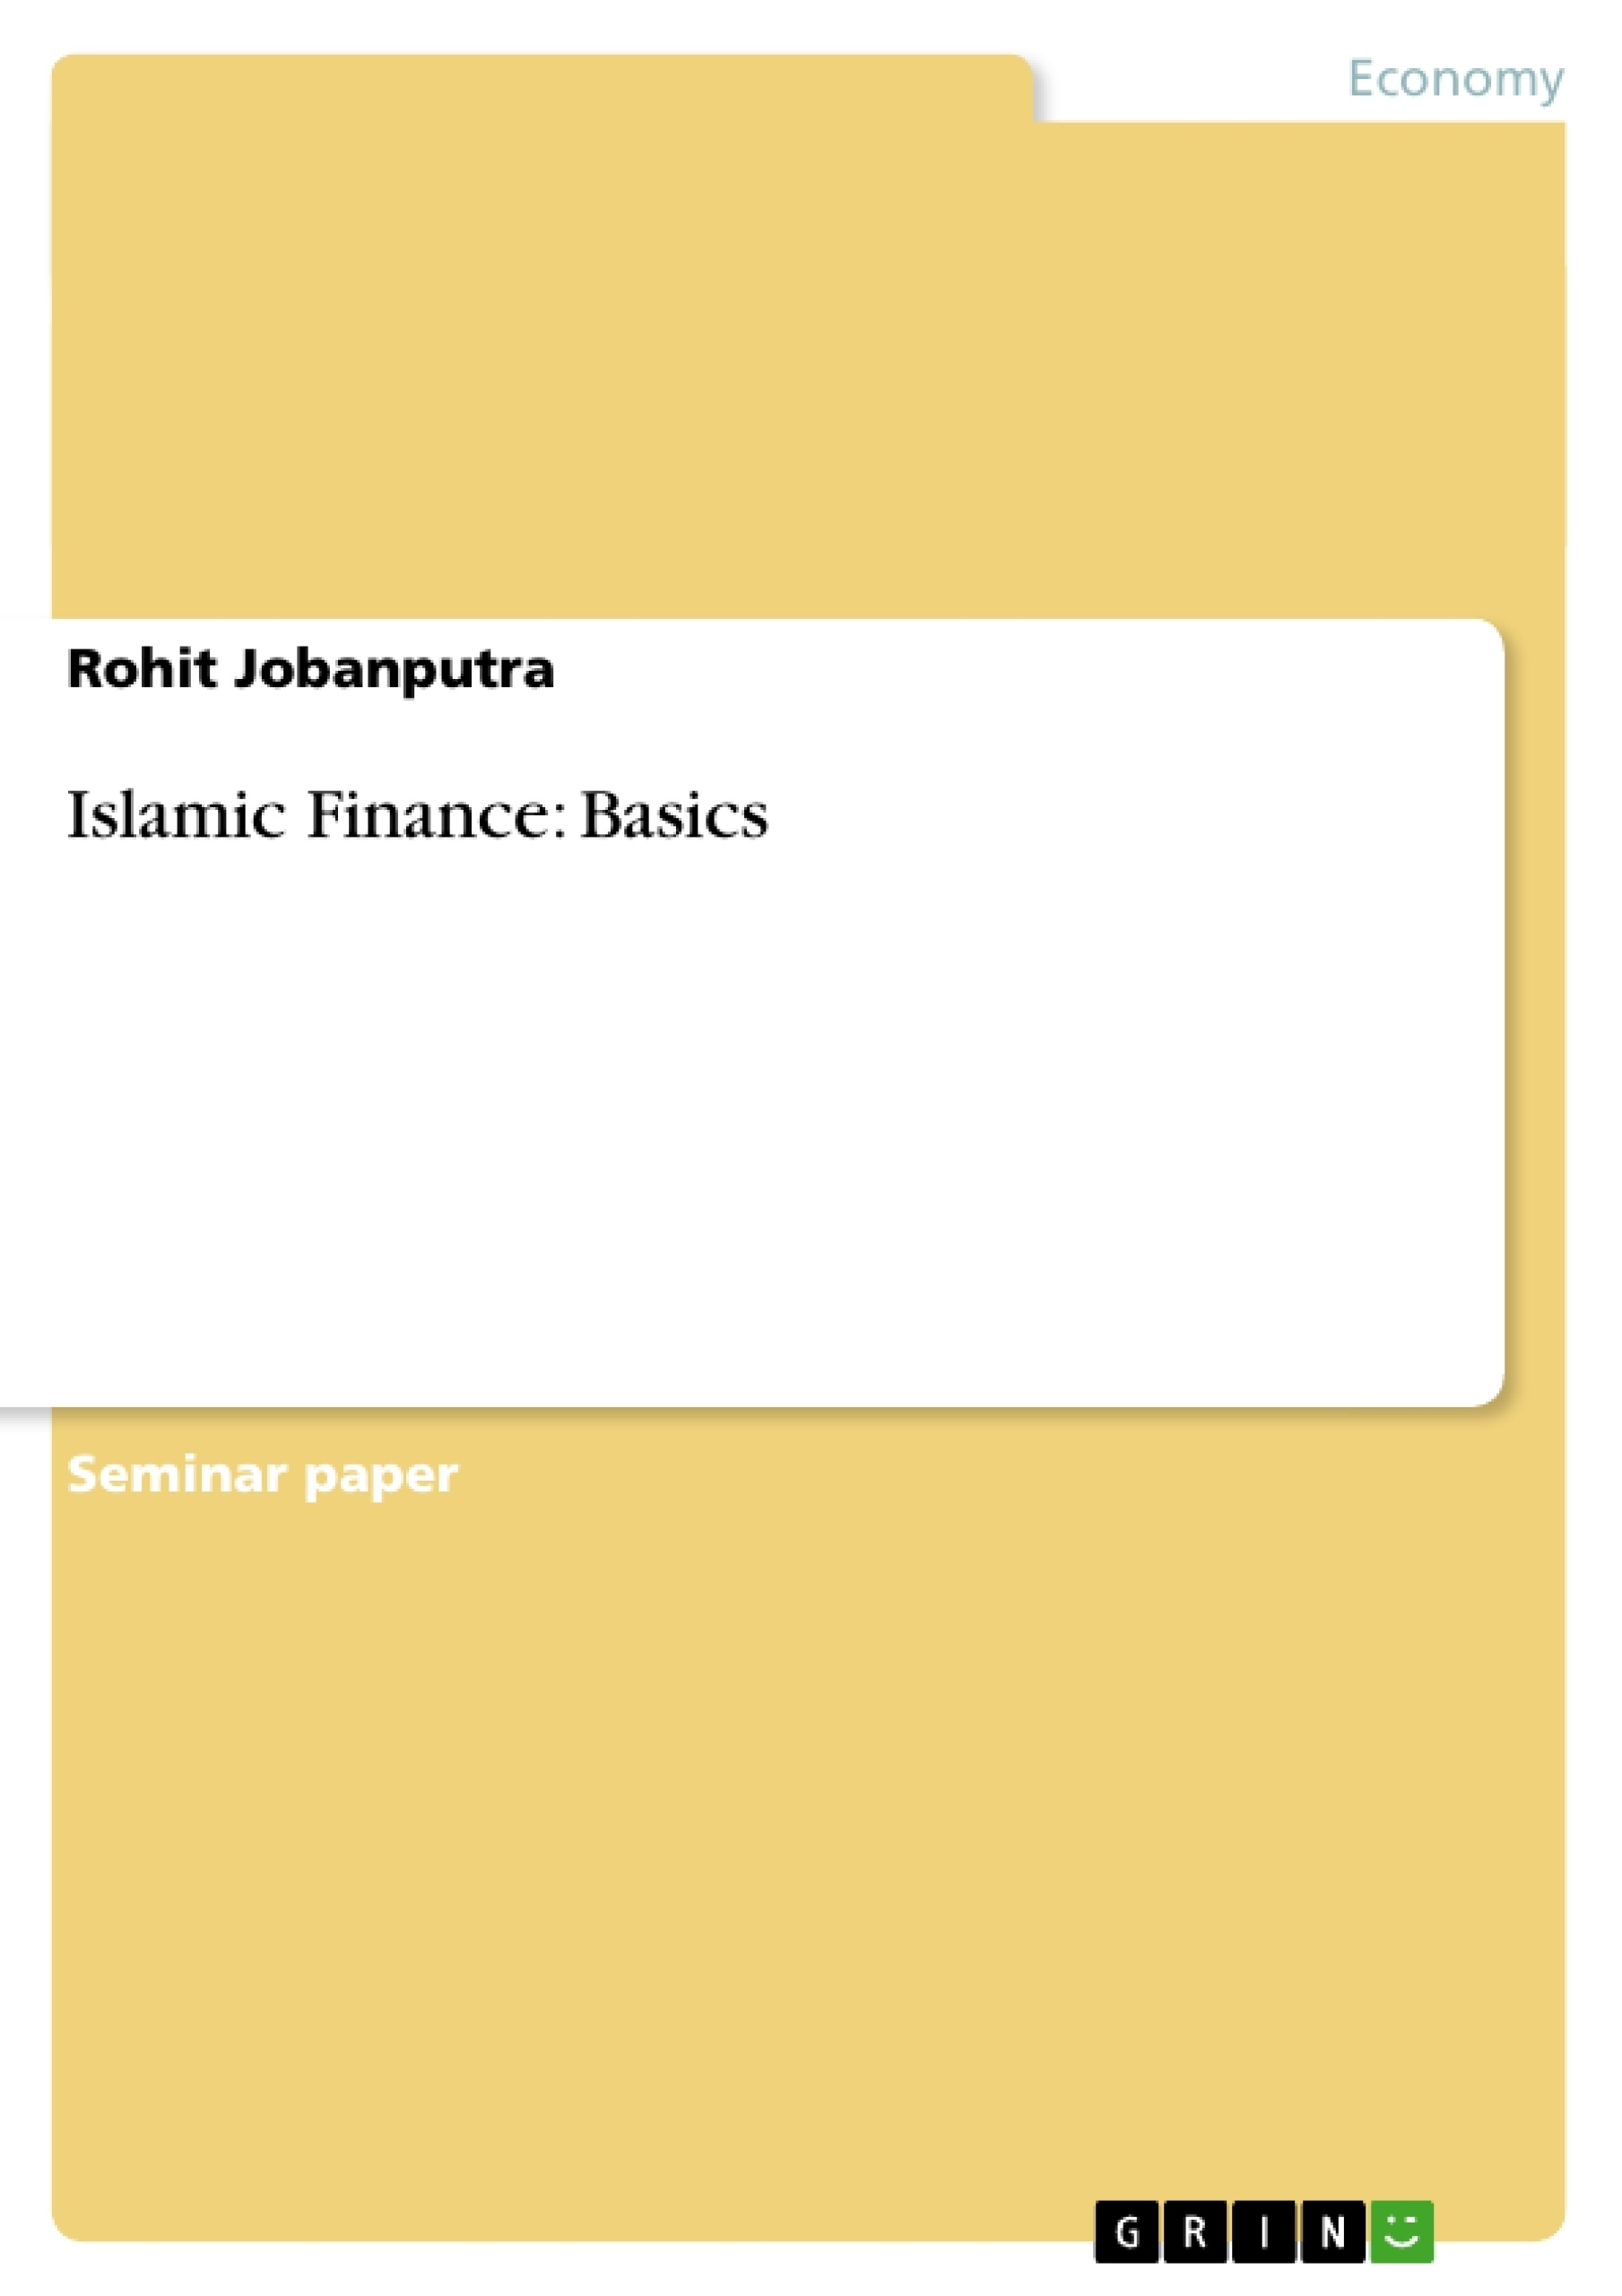 Title: Islamic Finance: Basics